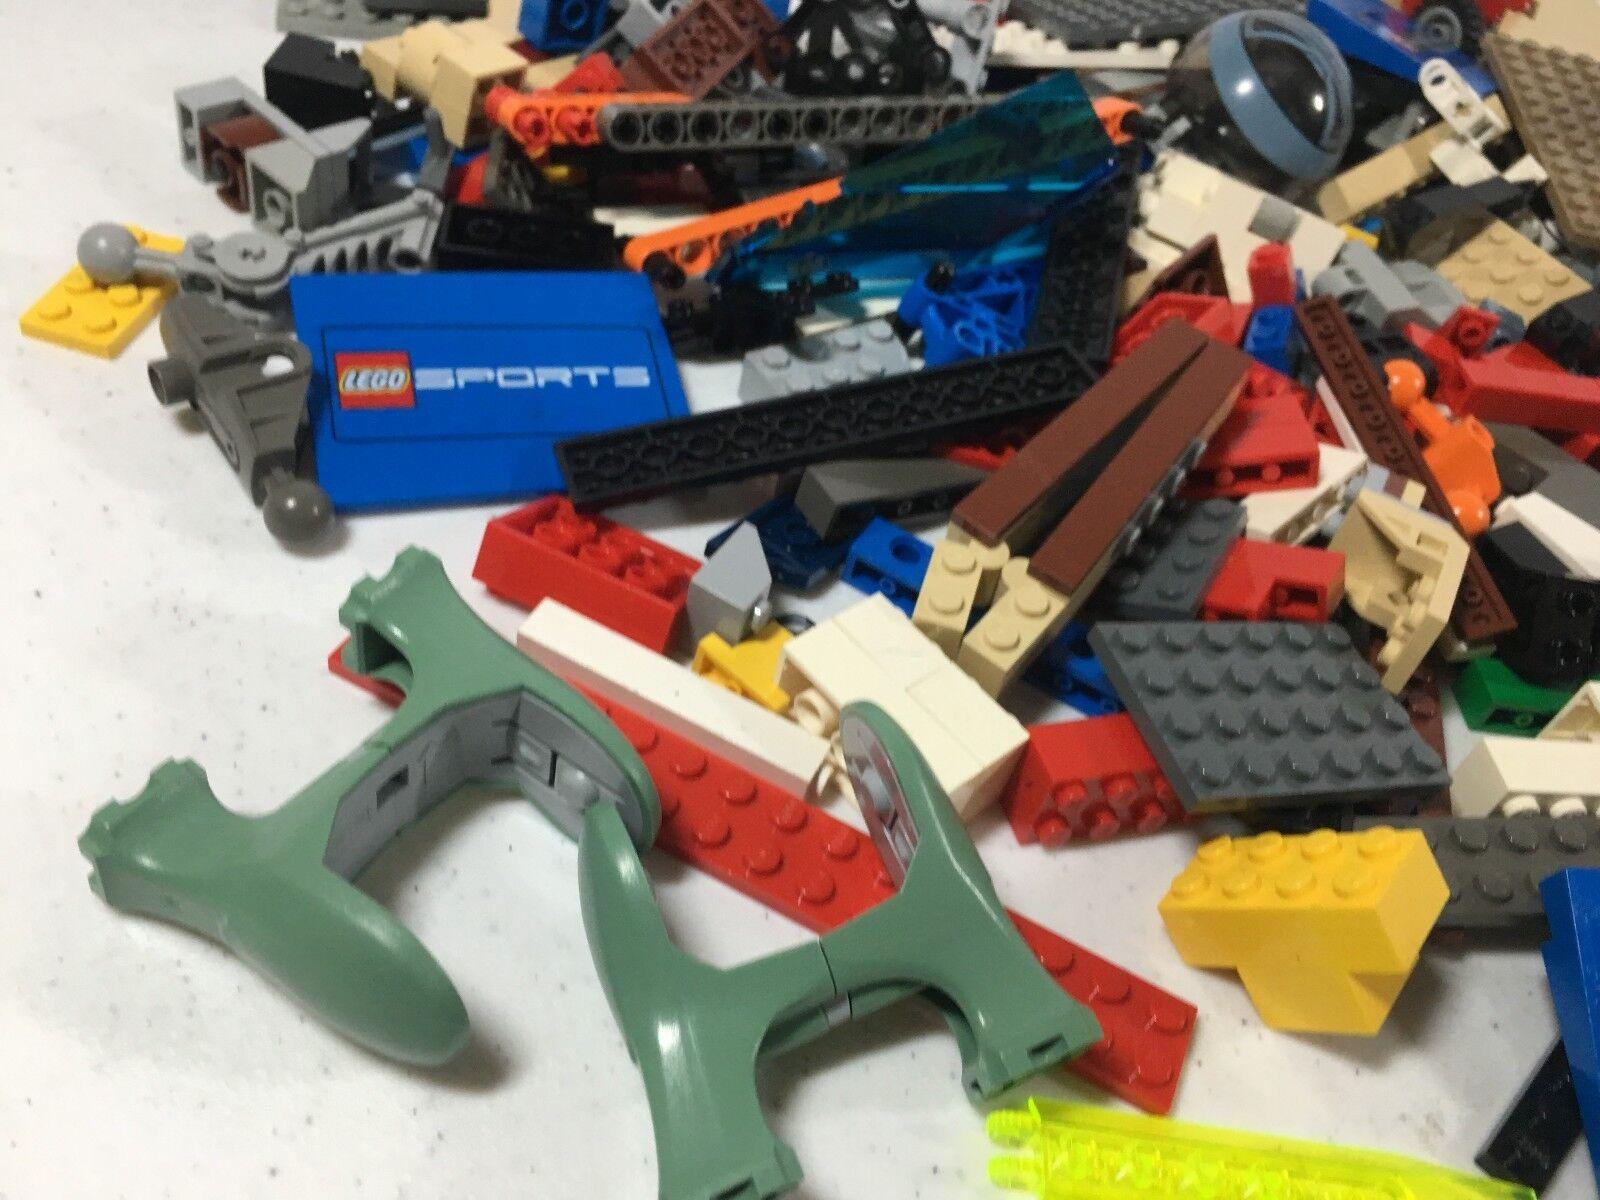 Lego Mixed Lot Lot Lot City Star Wars NBA Sports Various